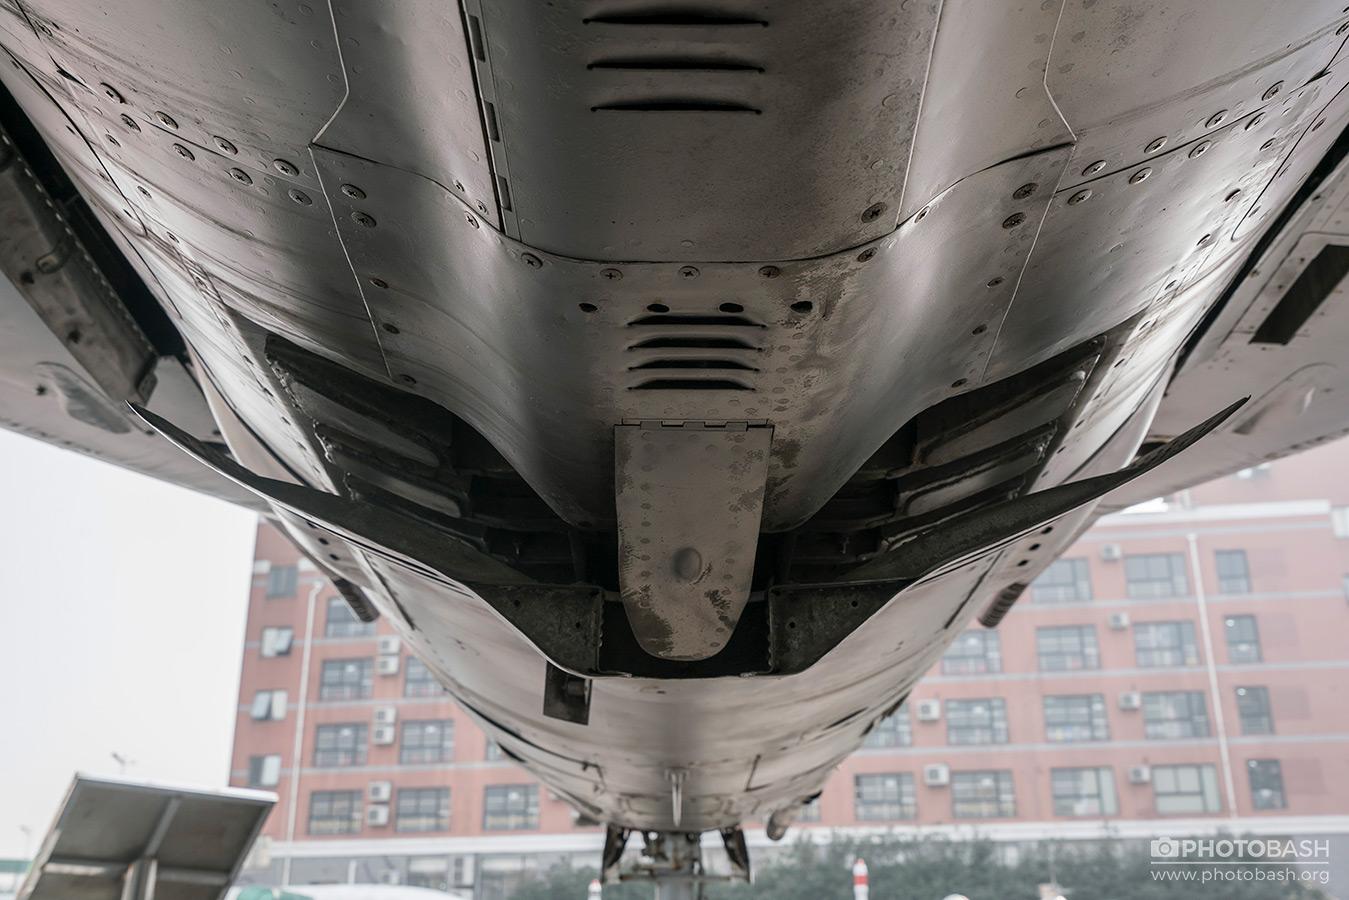 Soviet-Jet-Fighter-Fuselage-Mechanism.jpg